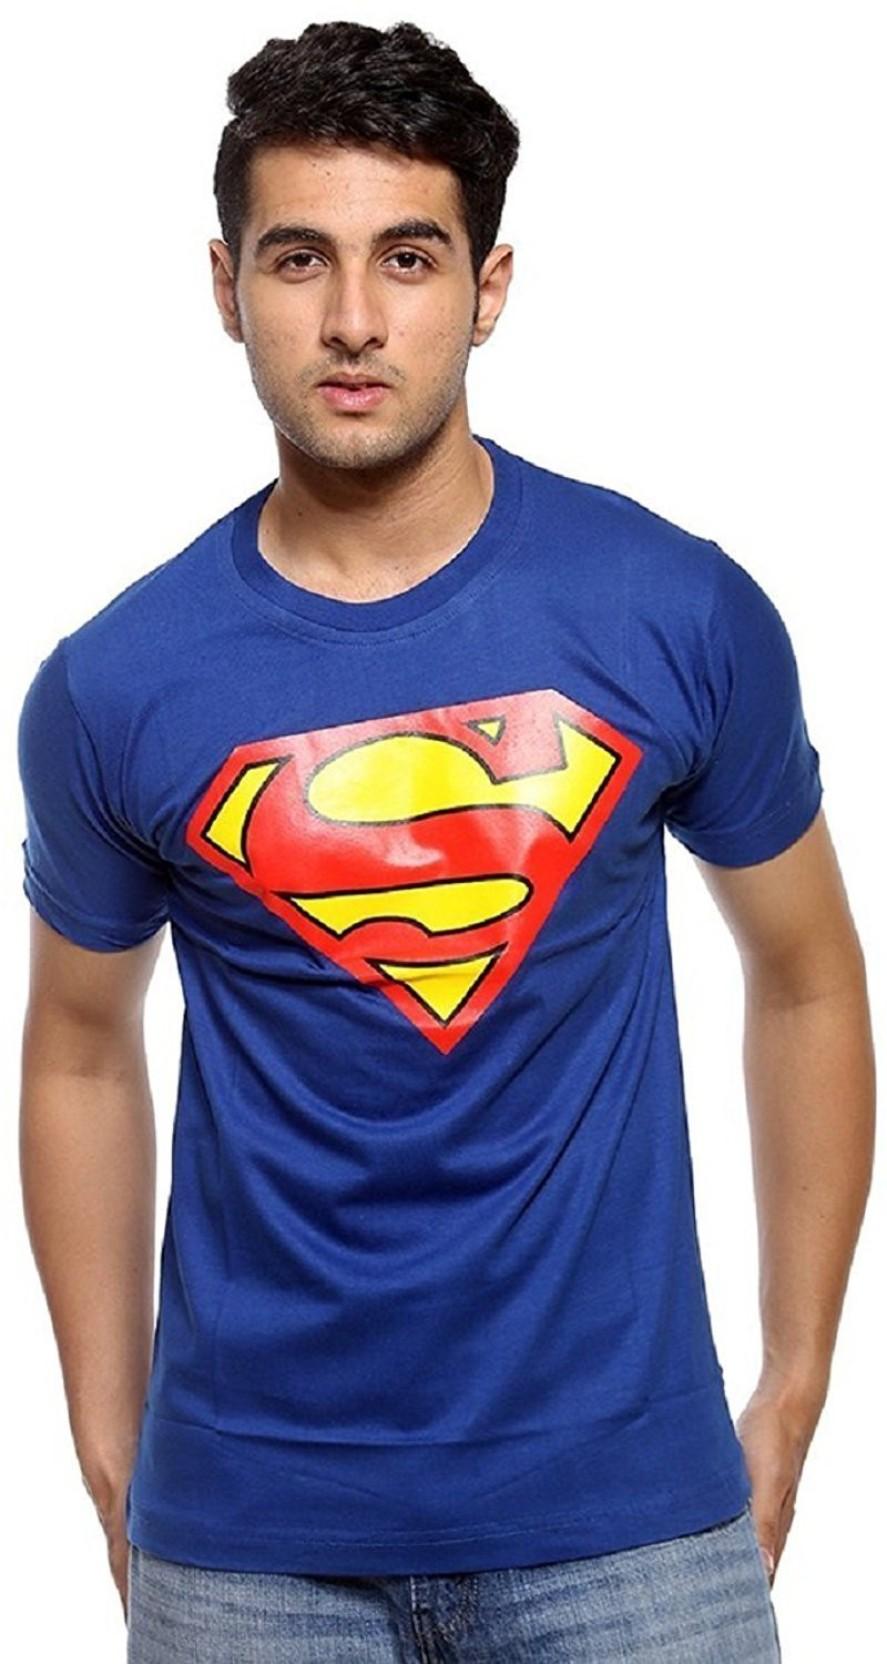 ce7f16ad Buy Superman T Shirts Online - DREAMWORKS